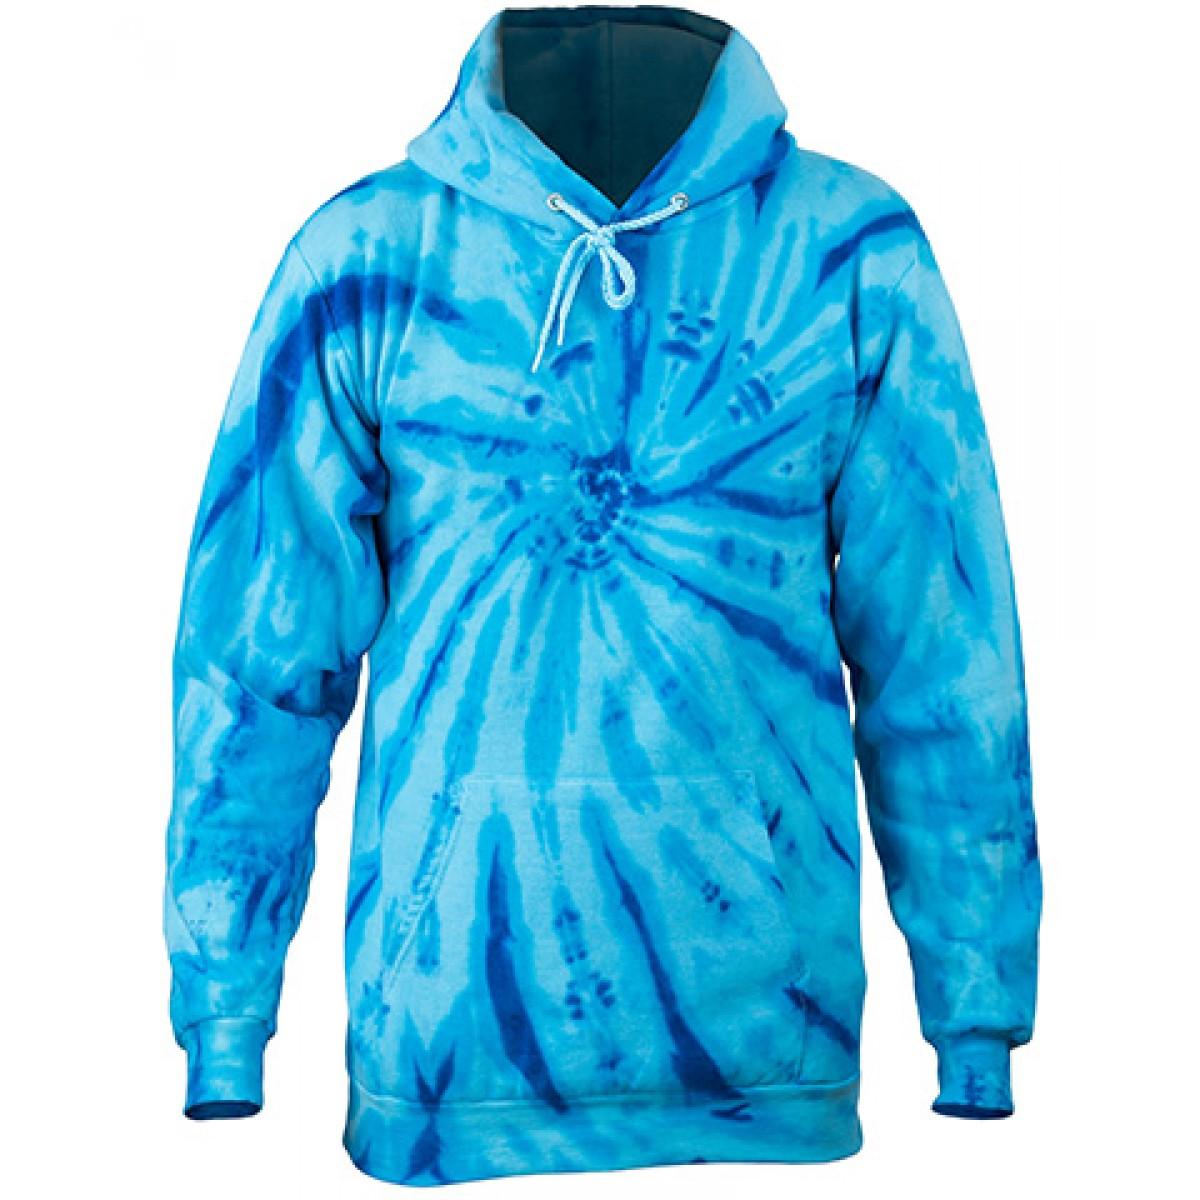 Tie-Dye Pullover Hooded Sweatshirt-Tropic Blue-2XL